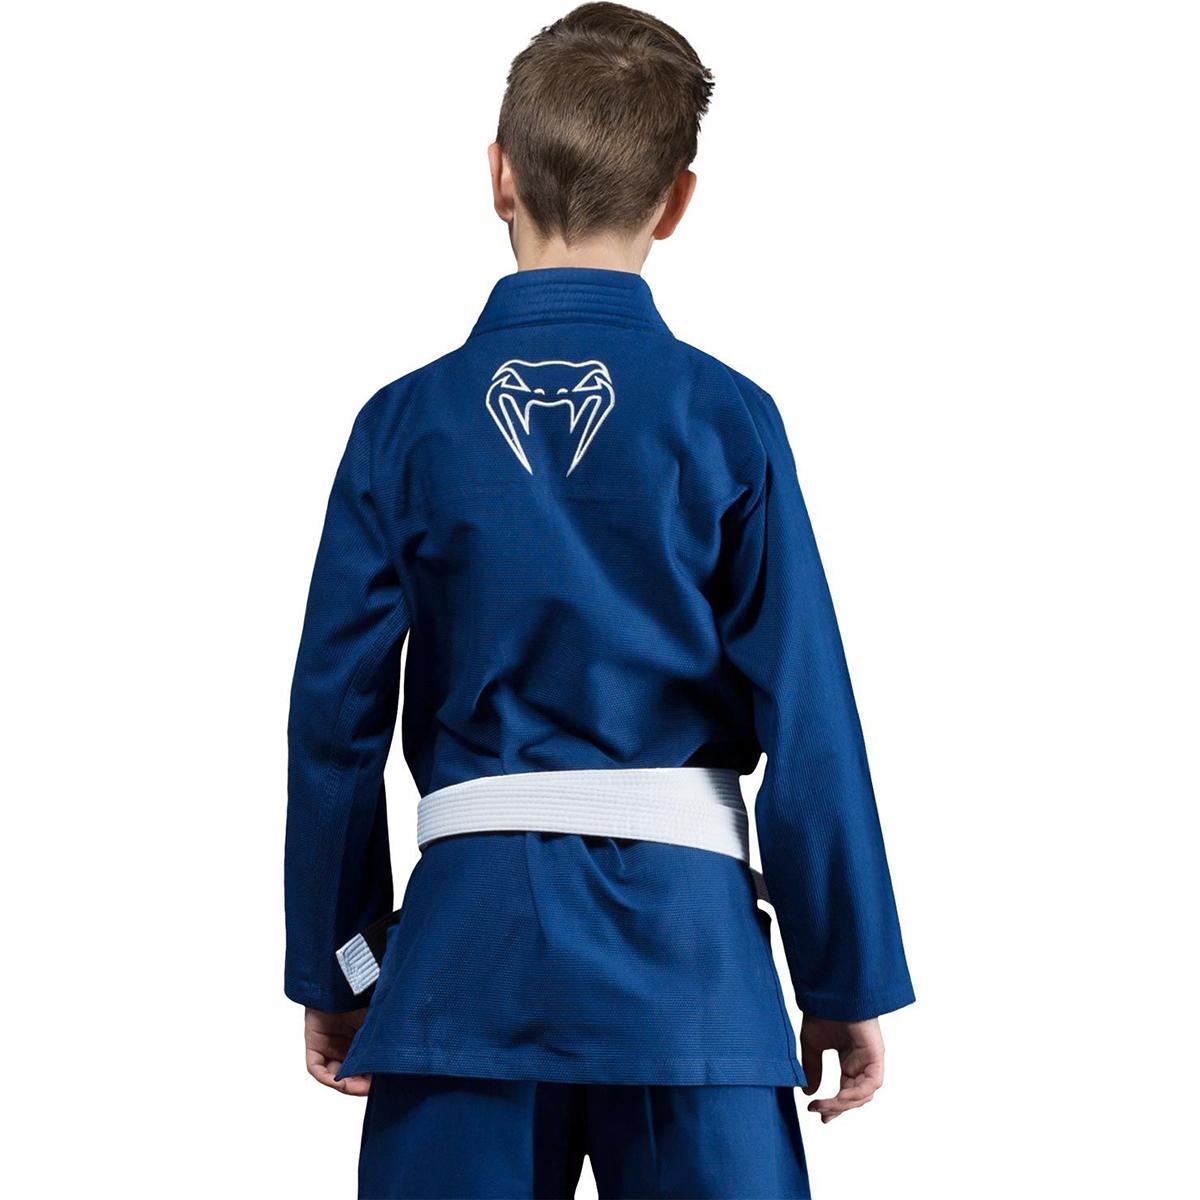 Blue Venum Kids Contender Brazilian Jiu-Jitsu Gi